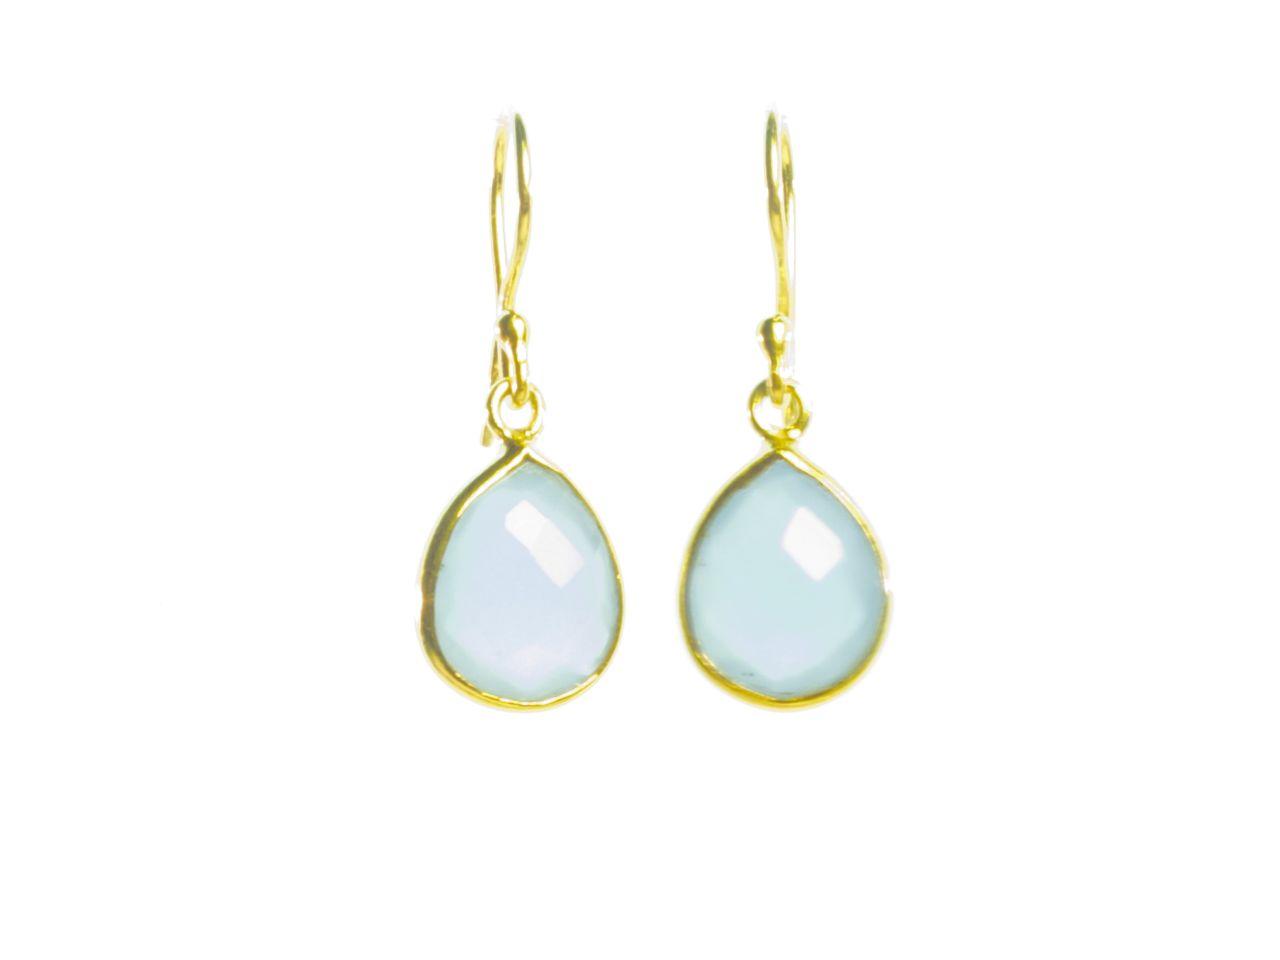 Earring Small Facet Cut Blue Chalcedony Tear Drop In A Setting – E1199